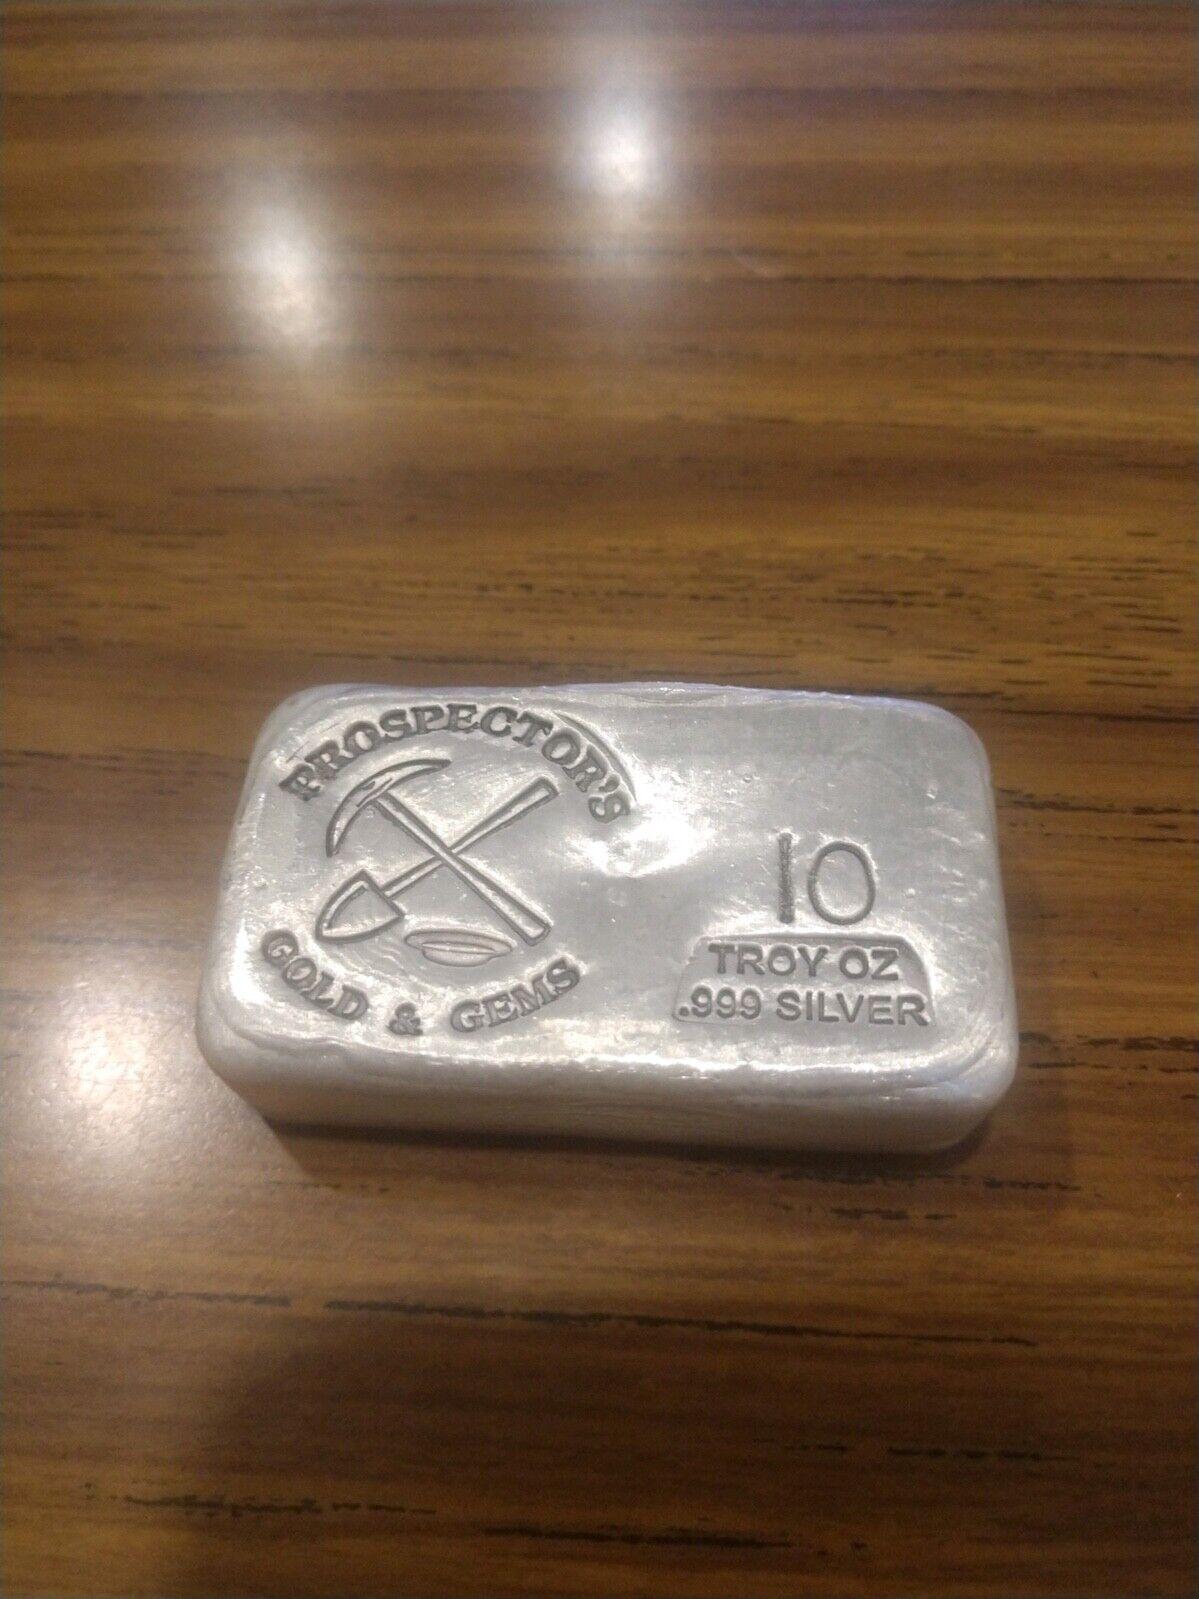 Prospector s Gold Gems 10 Troy Ounces Silver Bar .999 Silver - FREE SHIP - $265.00